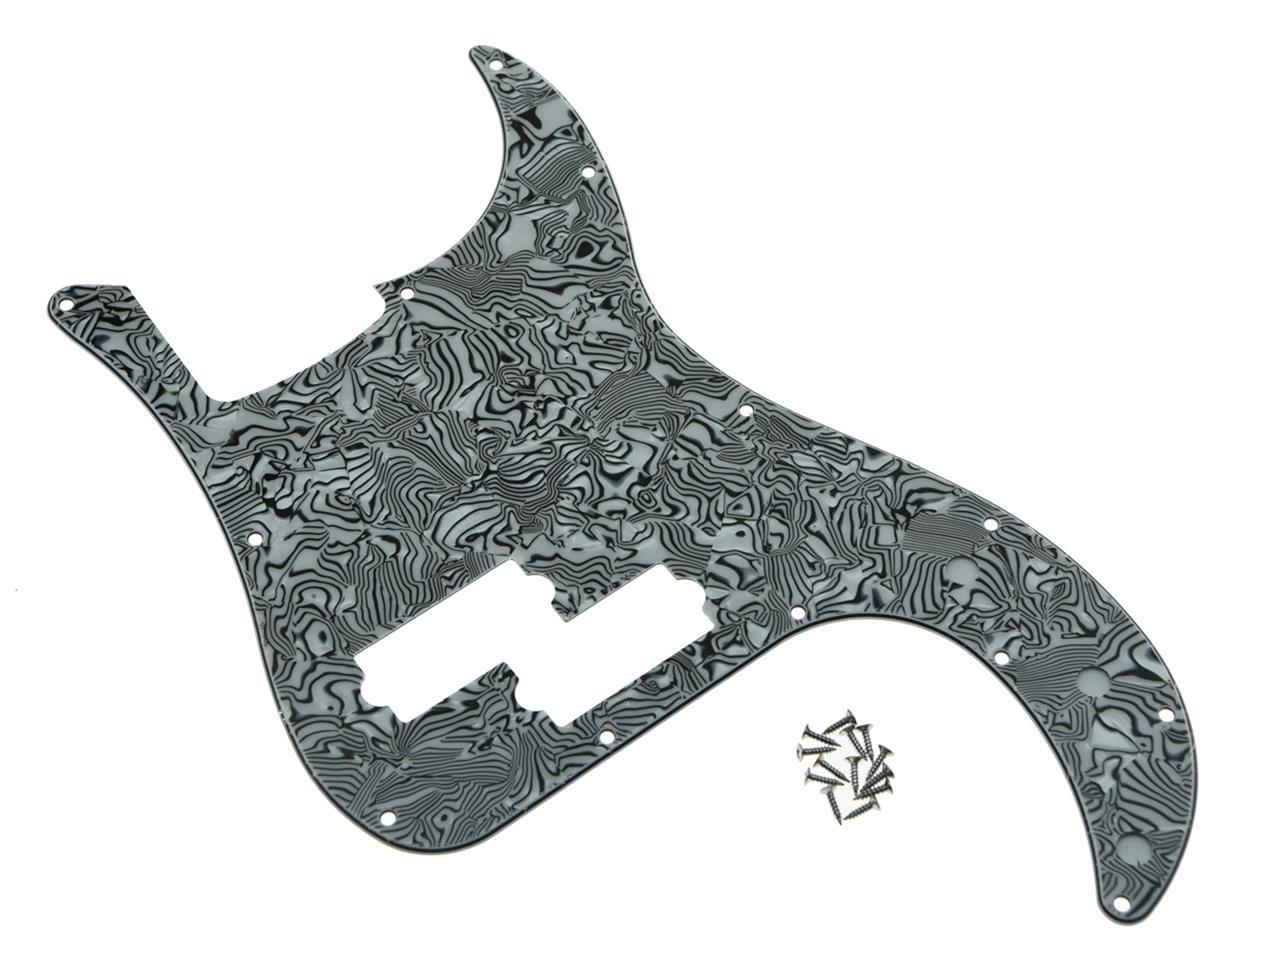 KAISH 13 Hole Precision Bass Pickguard PB P Bass Scratch Plate Fits USA/Mexican Fender Precision Bass Black/White Shell